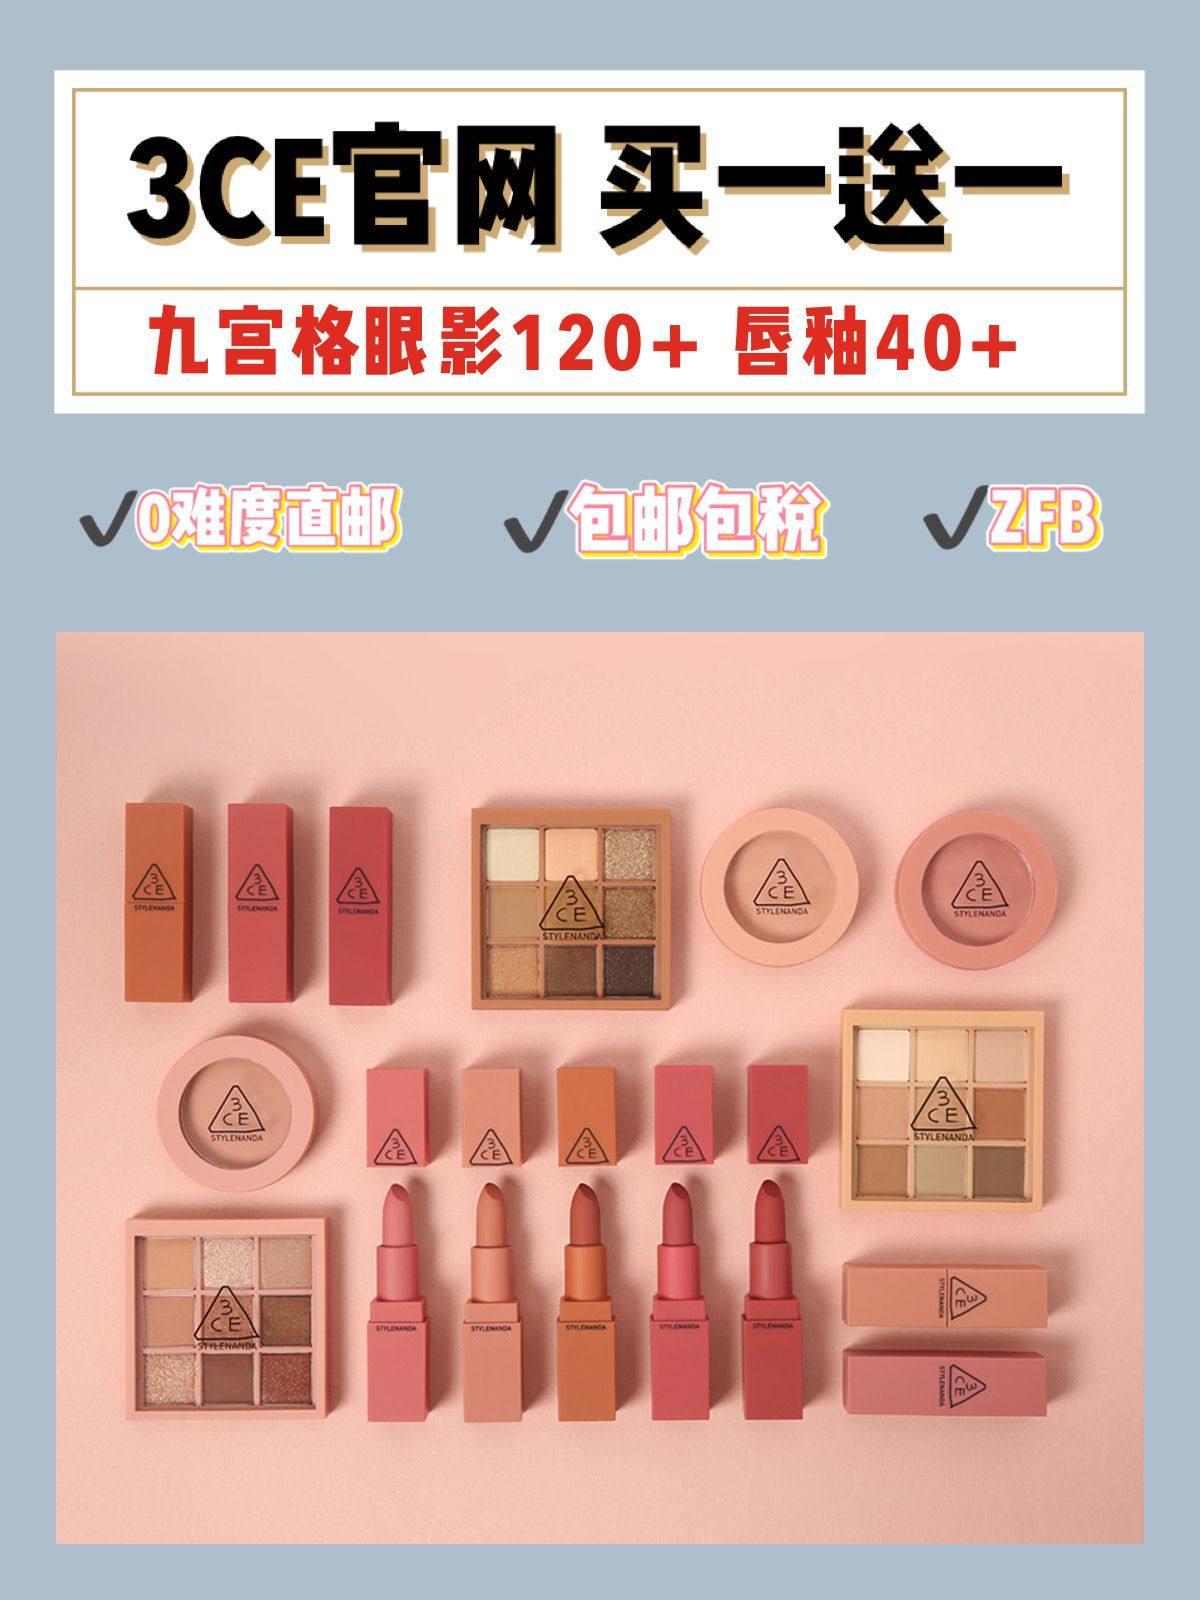 3CE官网海淘攻略,买一送一来了 stylenanda是韩国